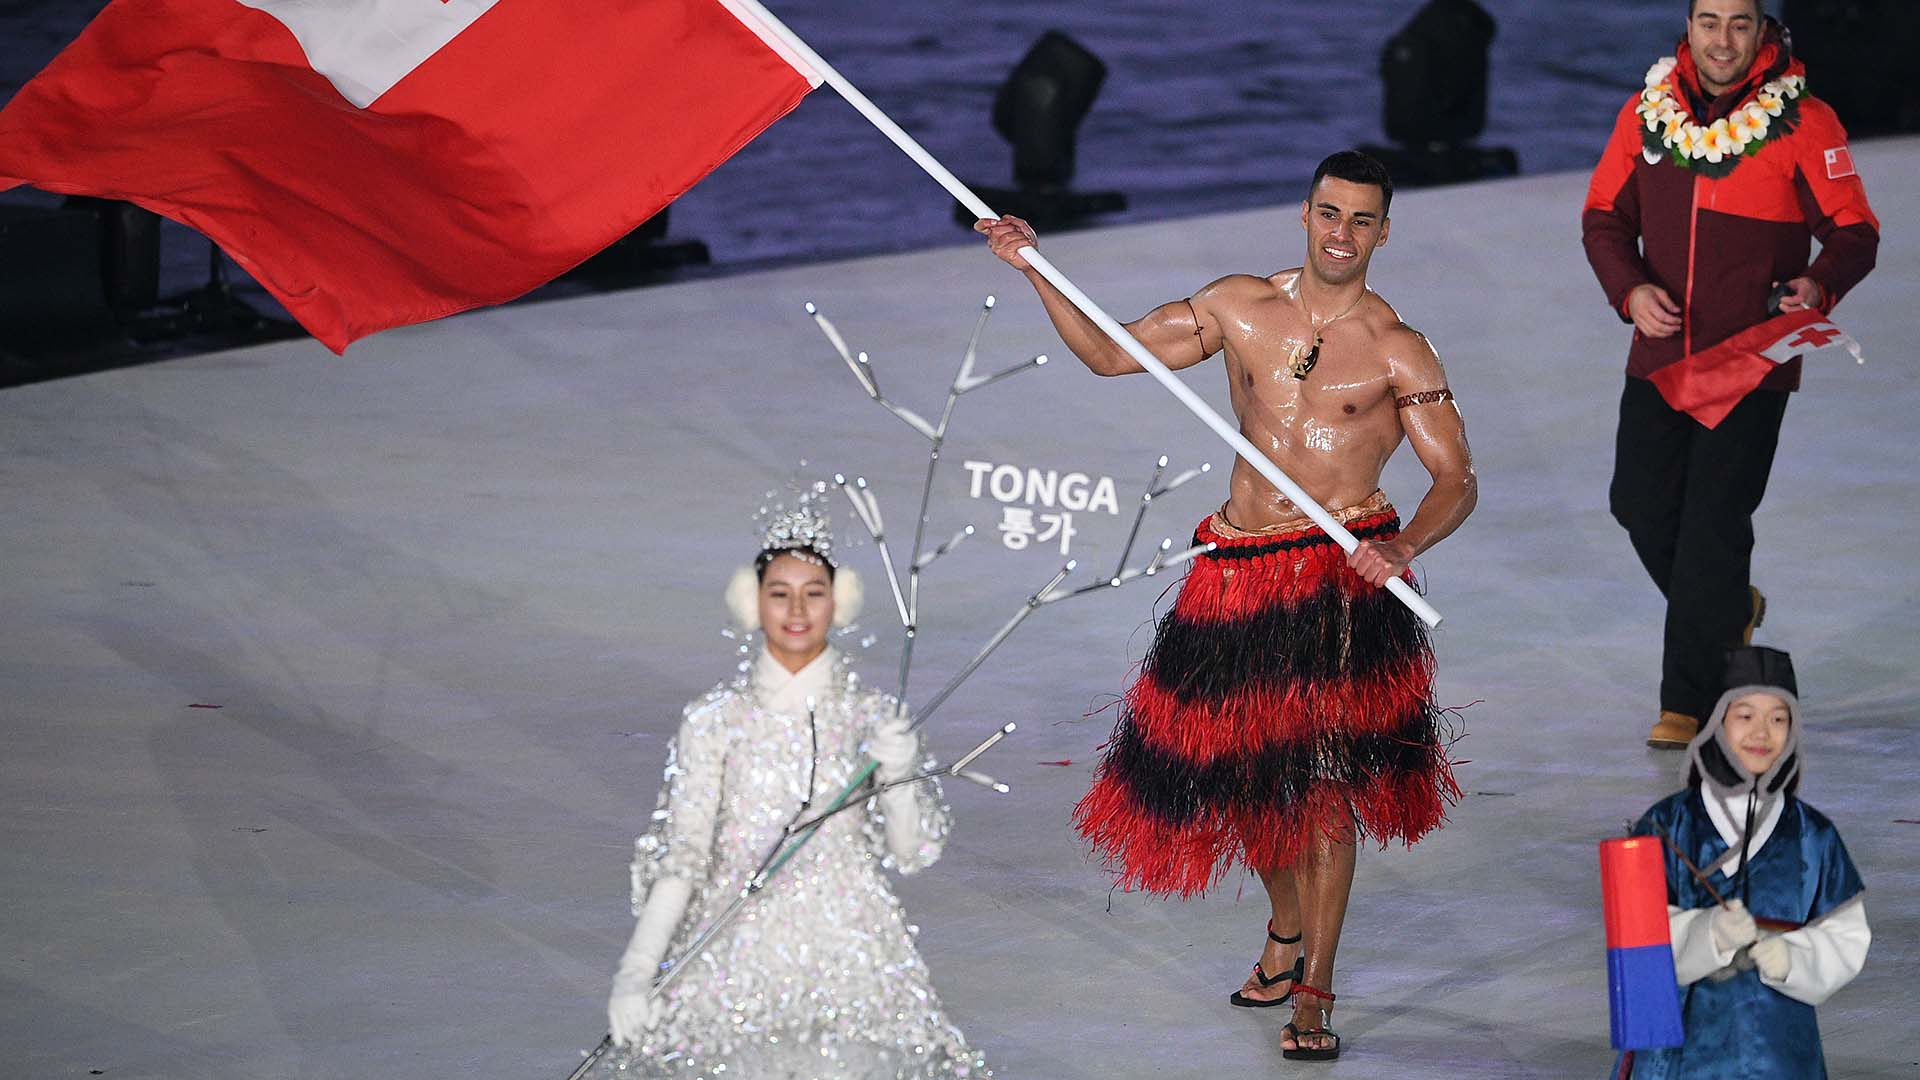 Tongas Pita Taufatofua goes topless again at Olympics